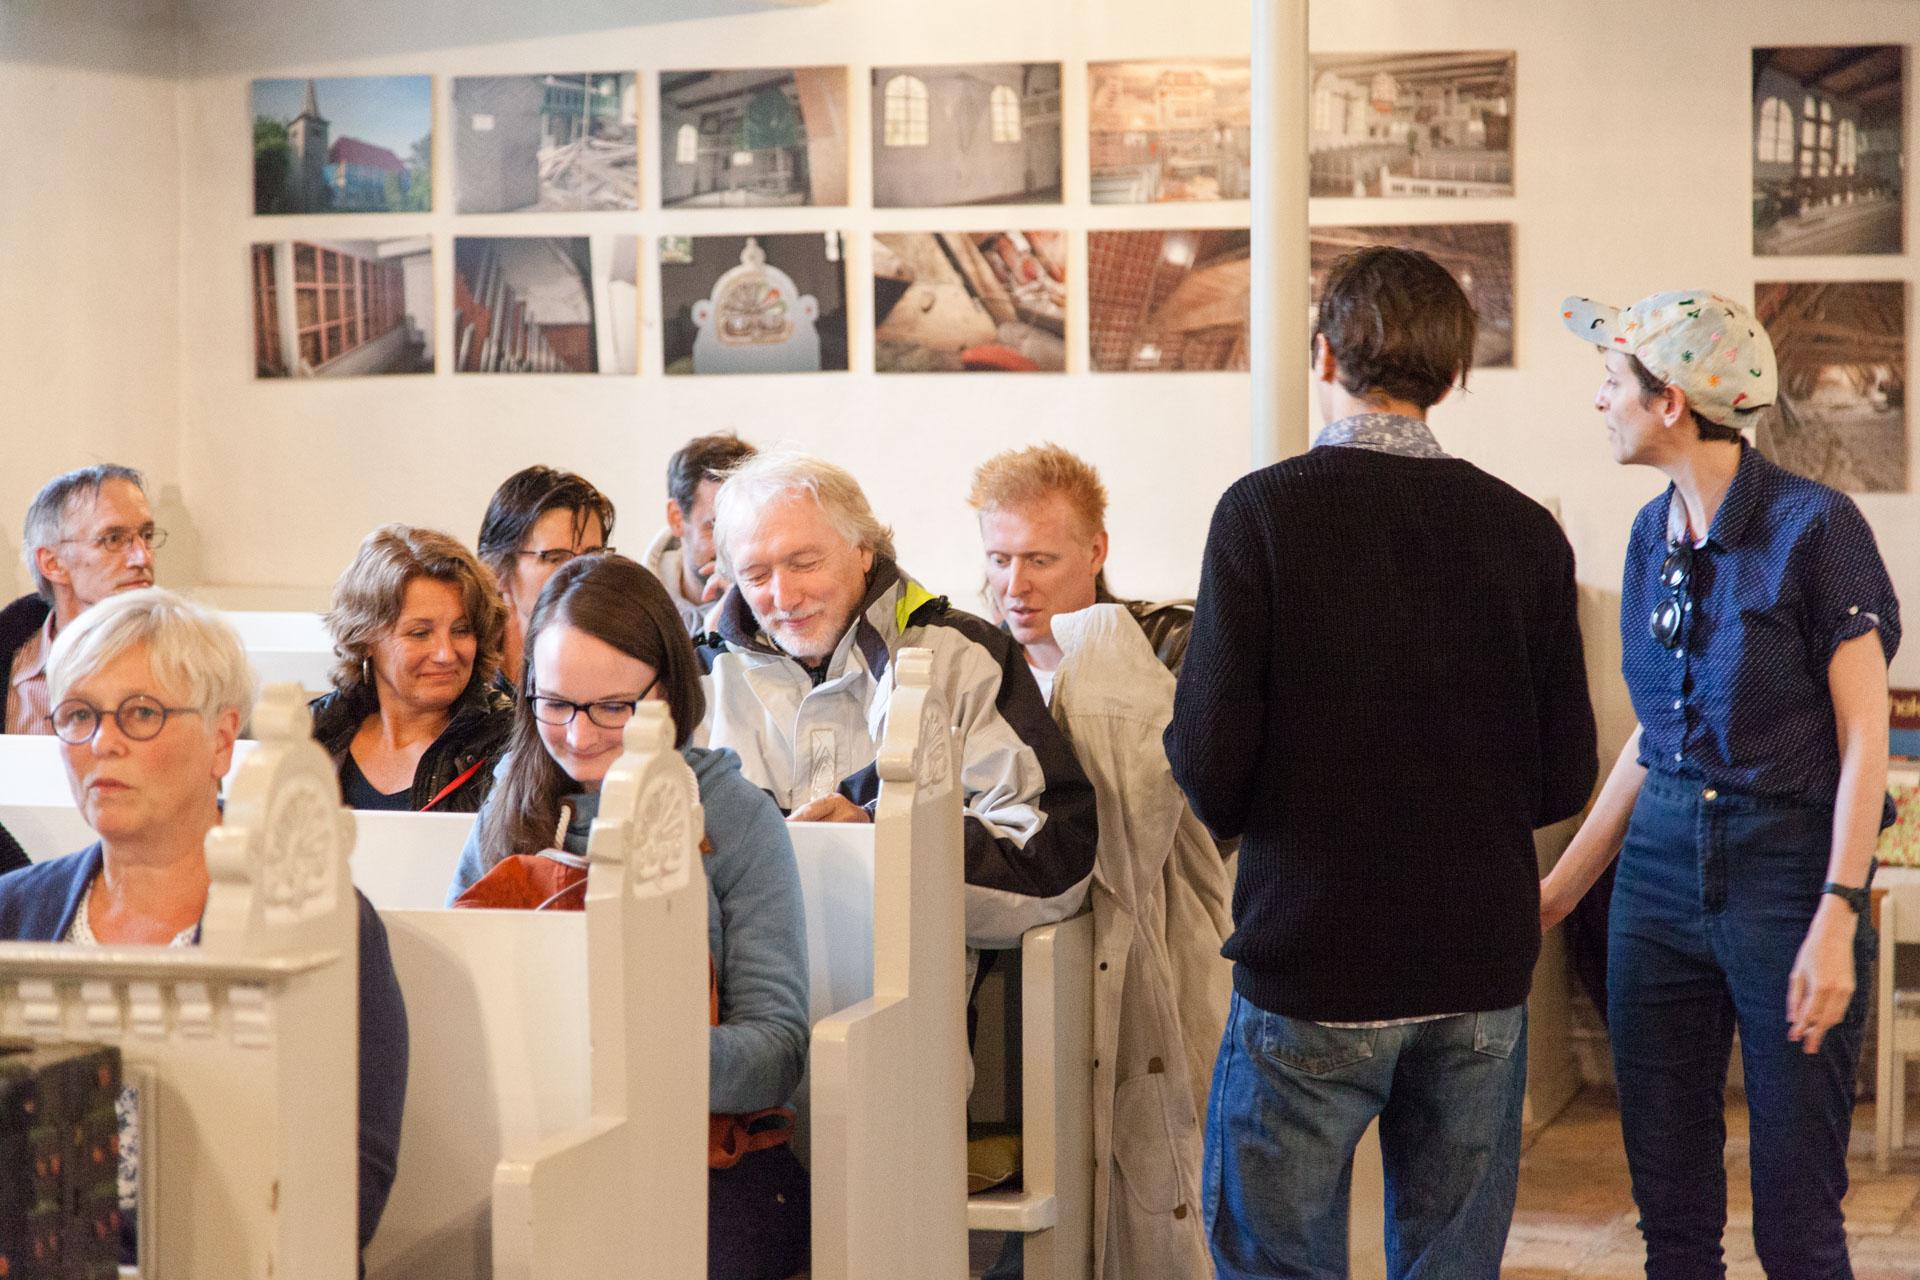 Annelyse Gelman & Auden Lincoln-Vogel, CLOUD SOCIETY – Site-Specific Performance